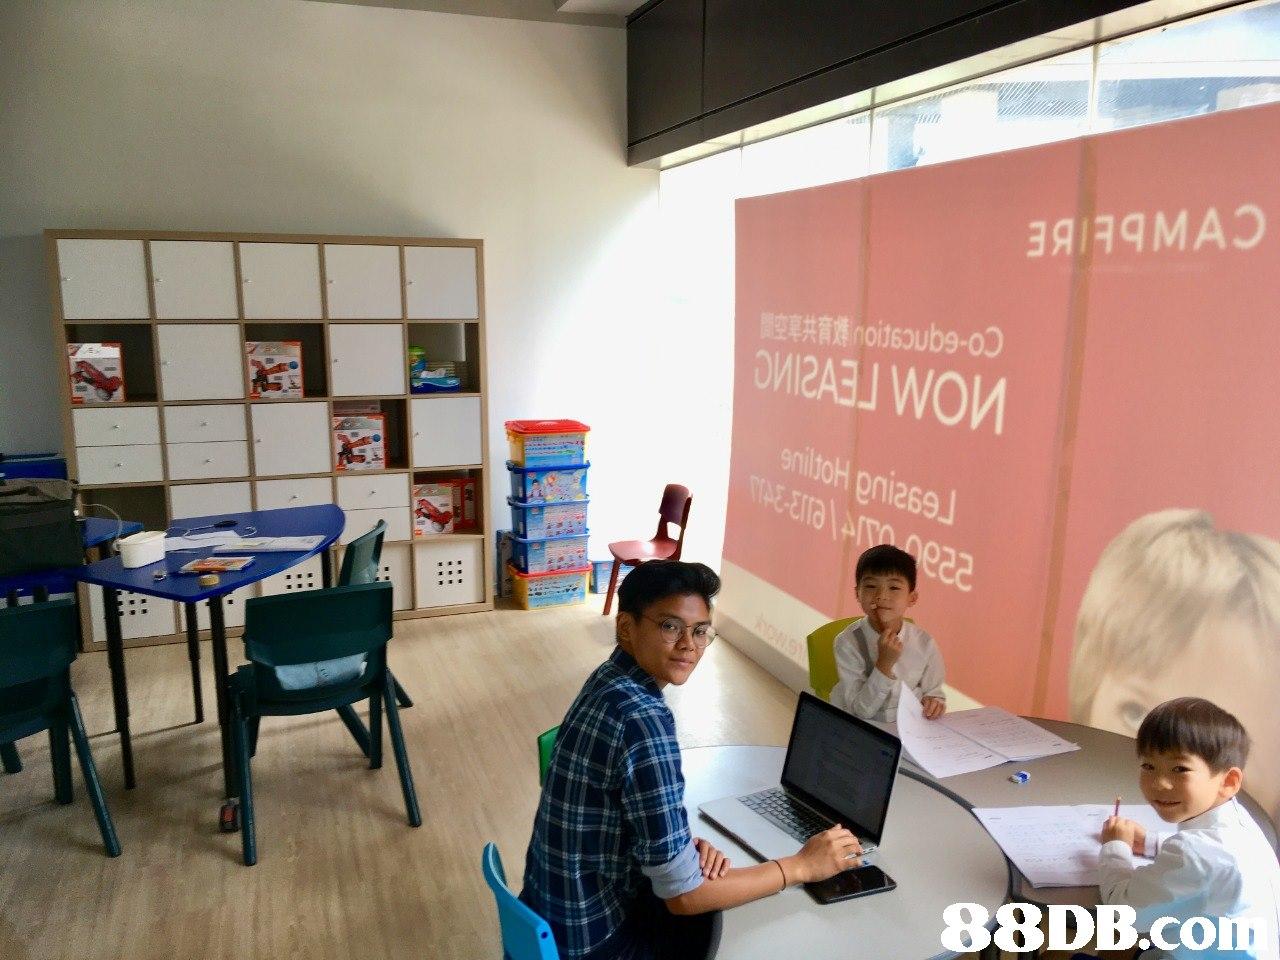 8DB.co  classroom,technology,education,